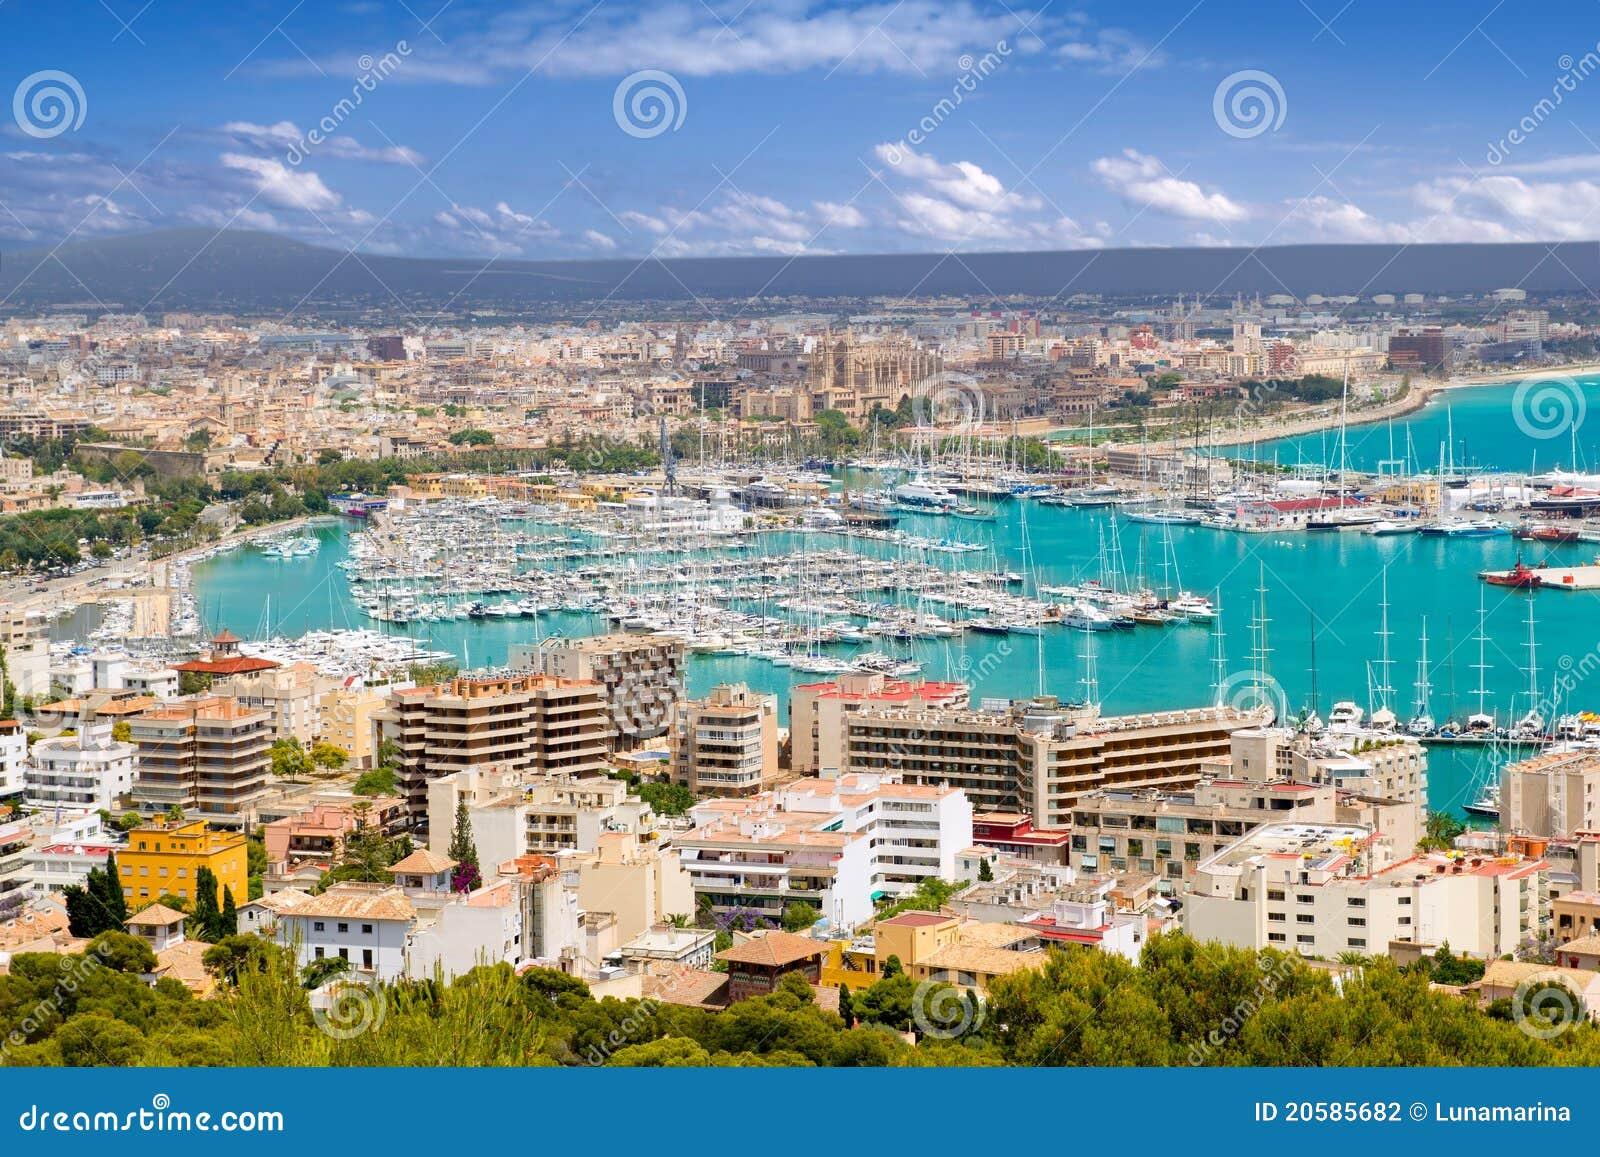 City in Majorca Balearic island